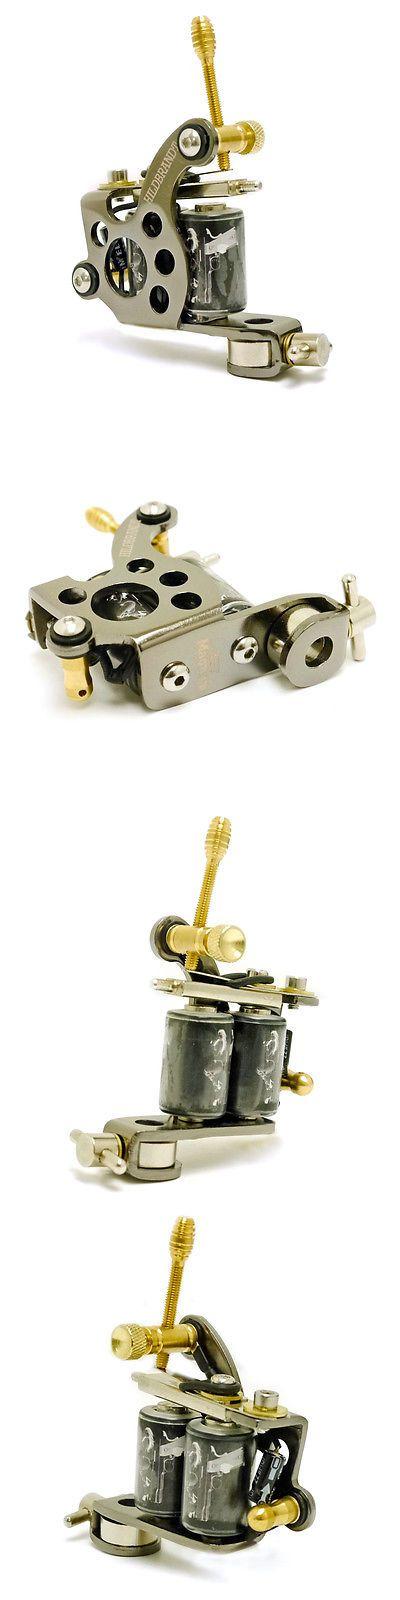 Tattoo Machines and Parts: Hildbrandt .357 Magnum Tattoo Machine 8 Wrap Liner Tatoo Gun Coil Tatuage BUY IT NOW ONLY: $49.99